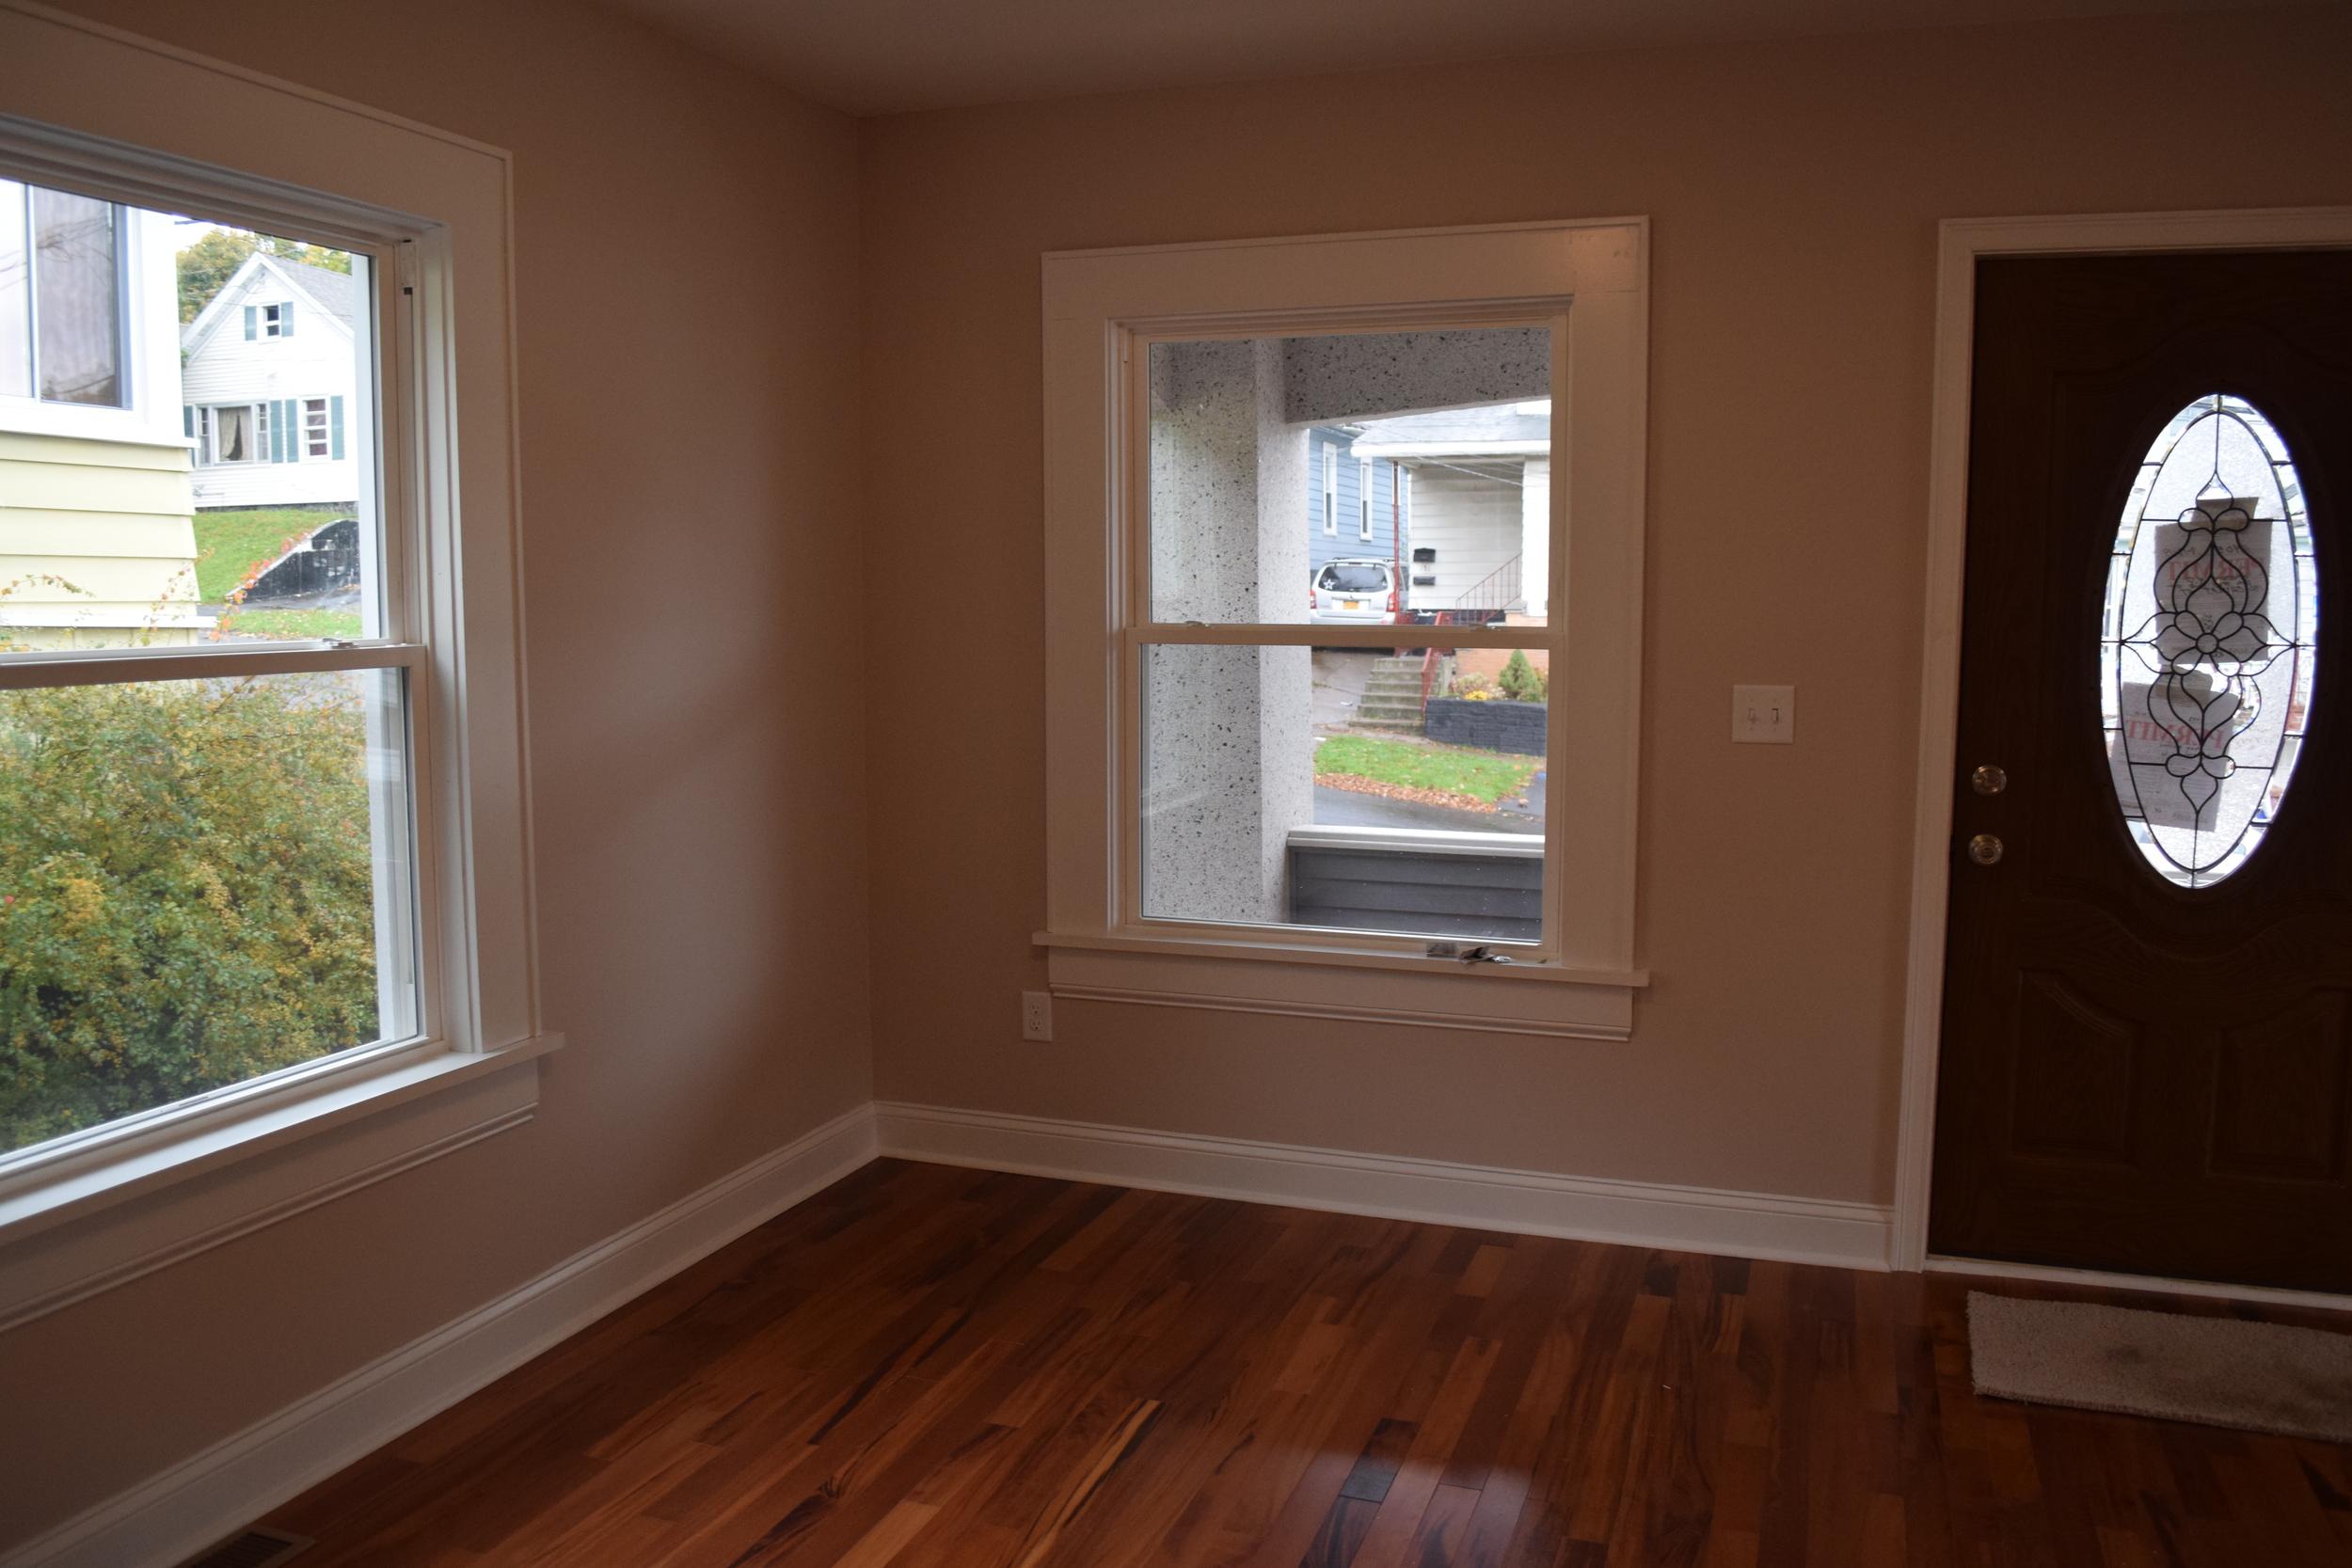 150 Culbert Front Room 2 After.JPG